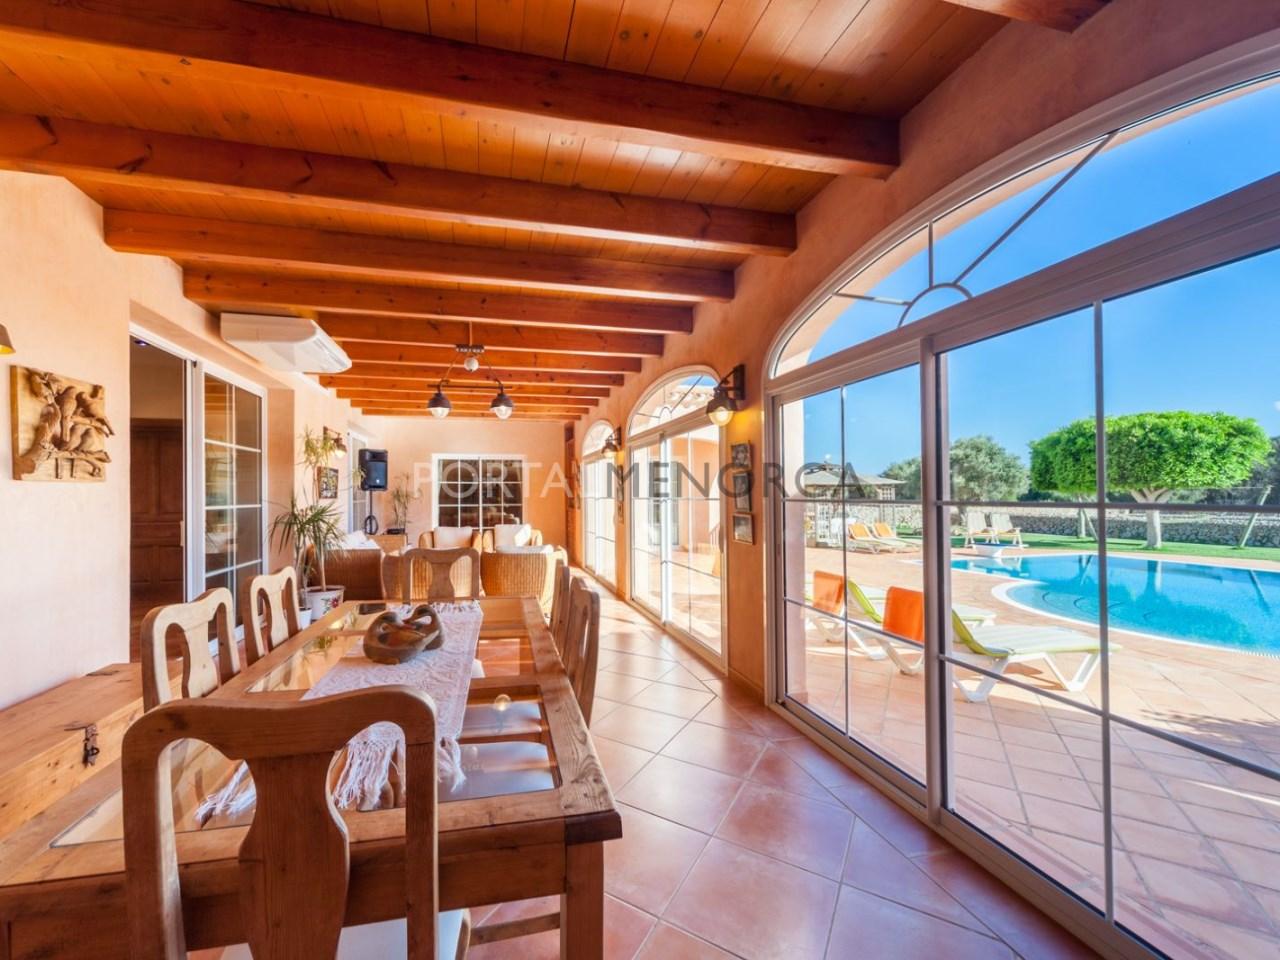 Casa de campo con piscina en Menorca (13 de 41)